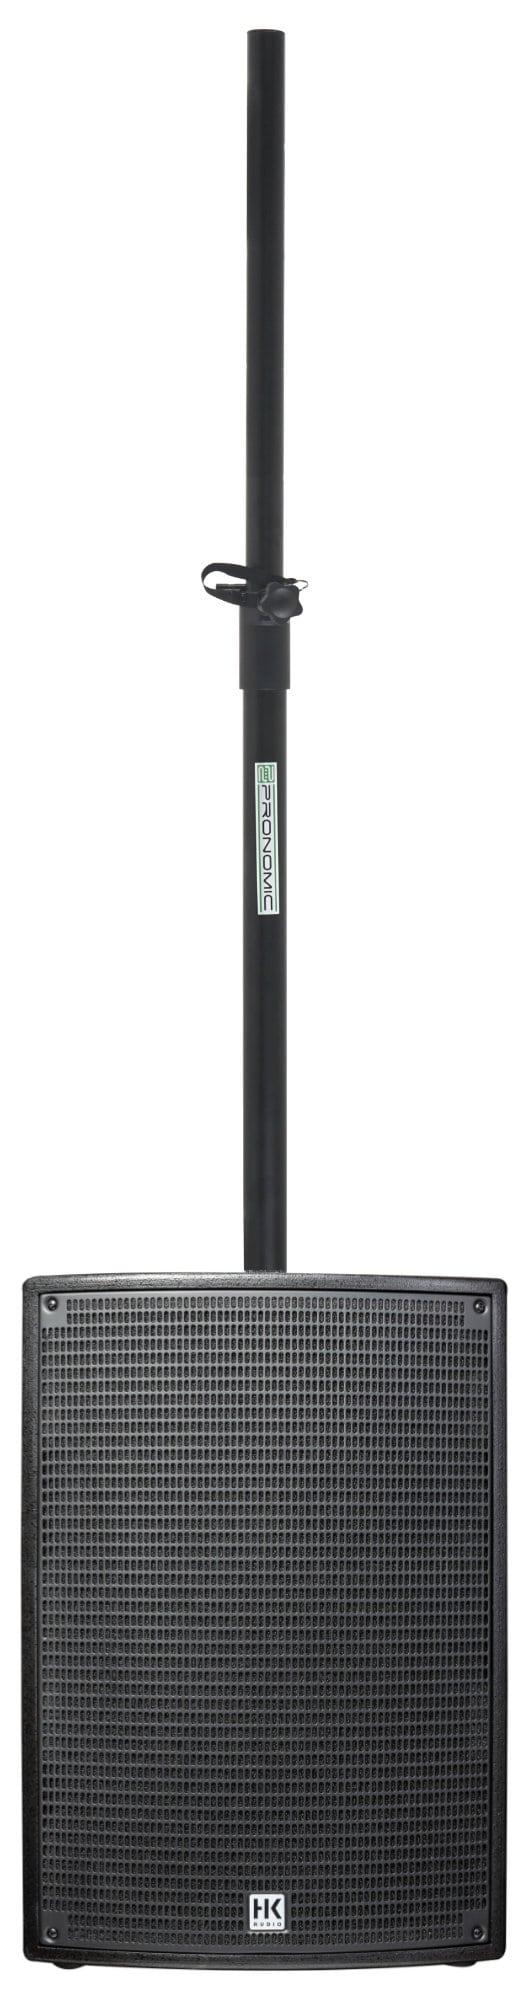 Paboxen - HK Audio Sonar 115 Sub D Set inkl. Distanzstange - Onlineshop Musikhaus Kirstein